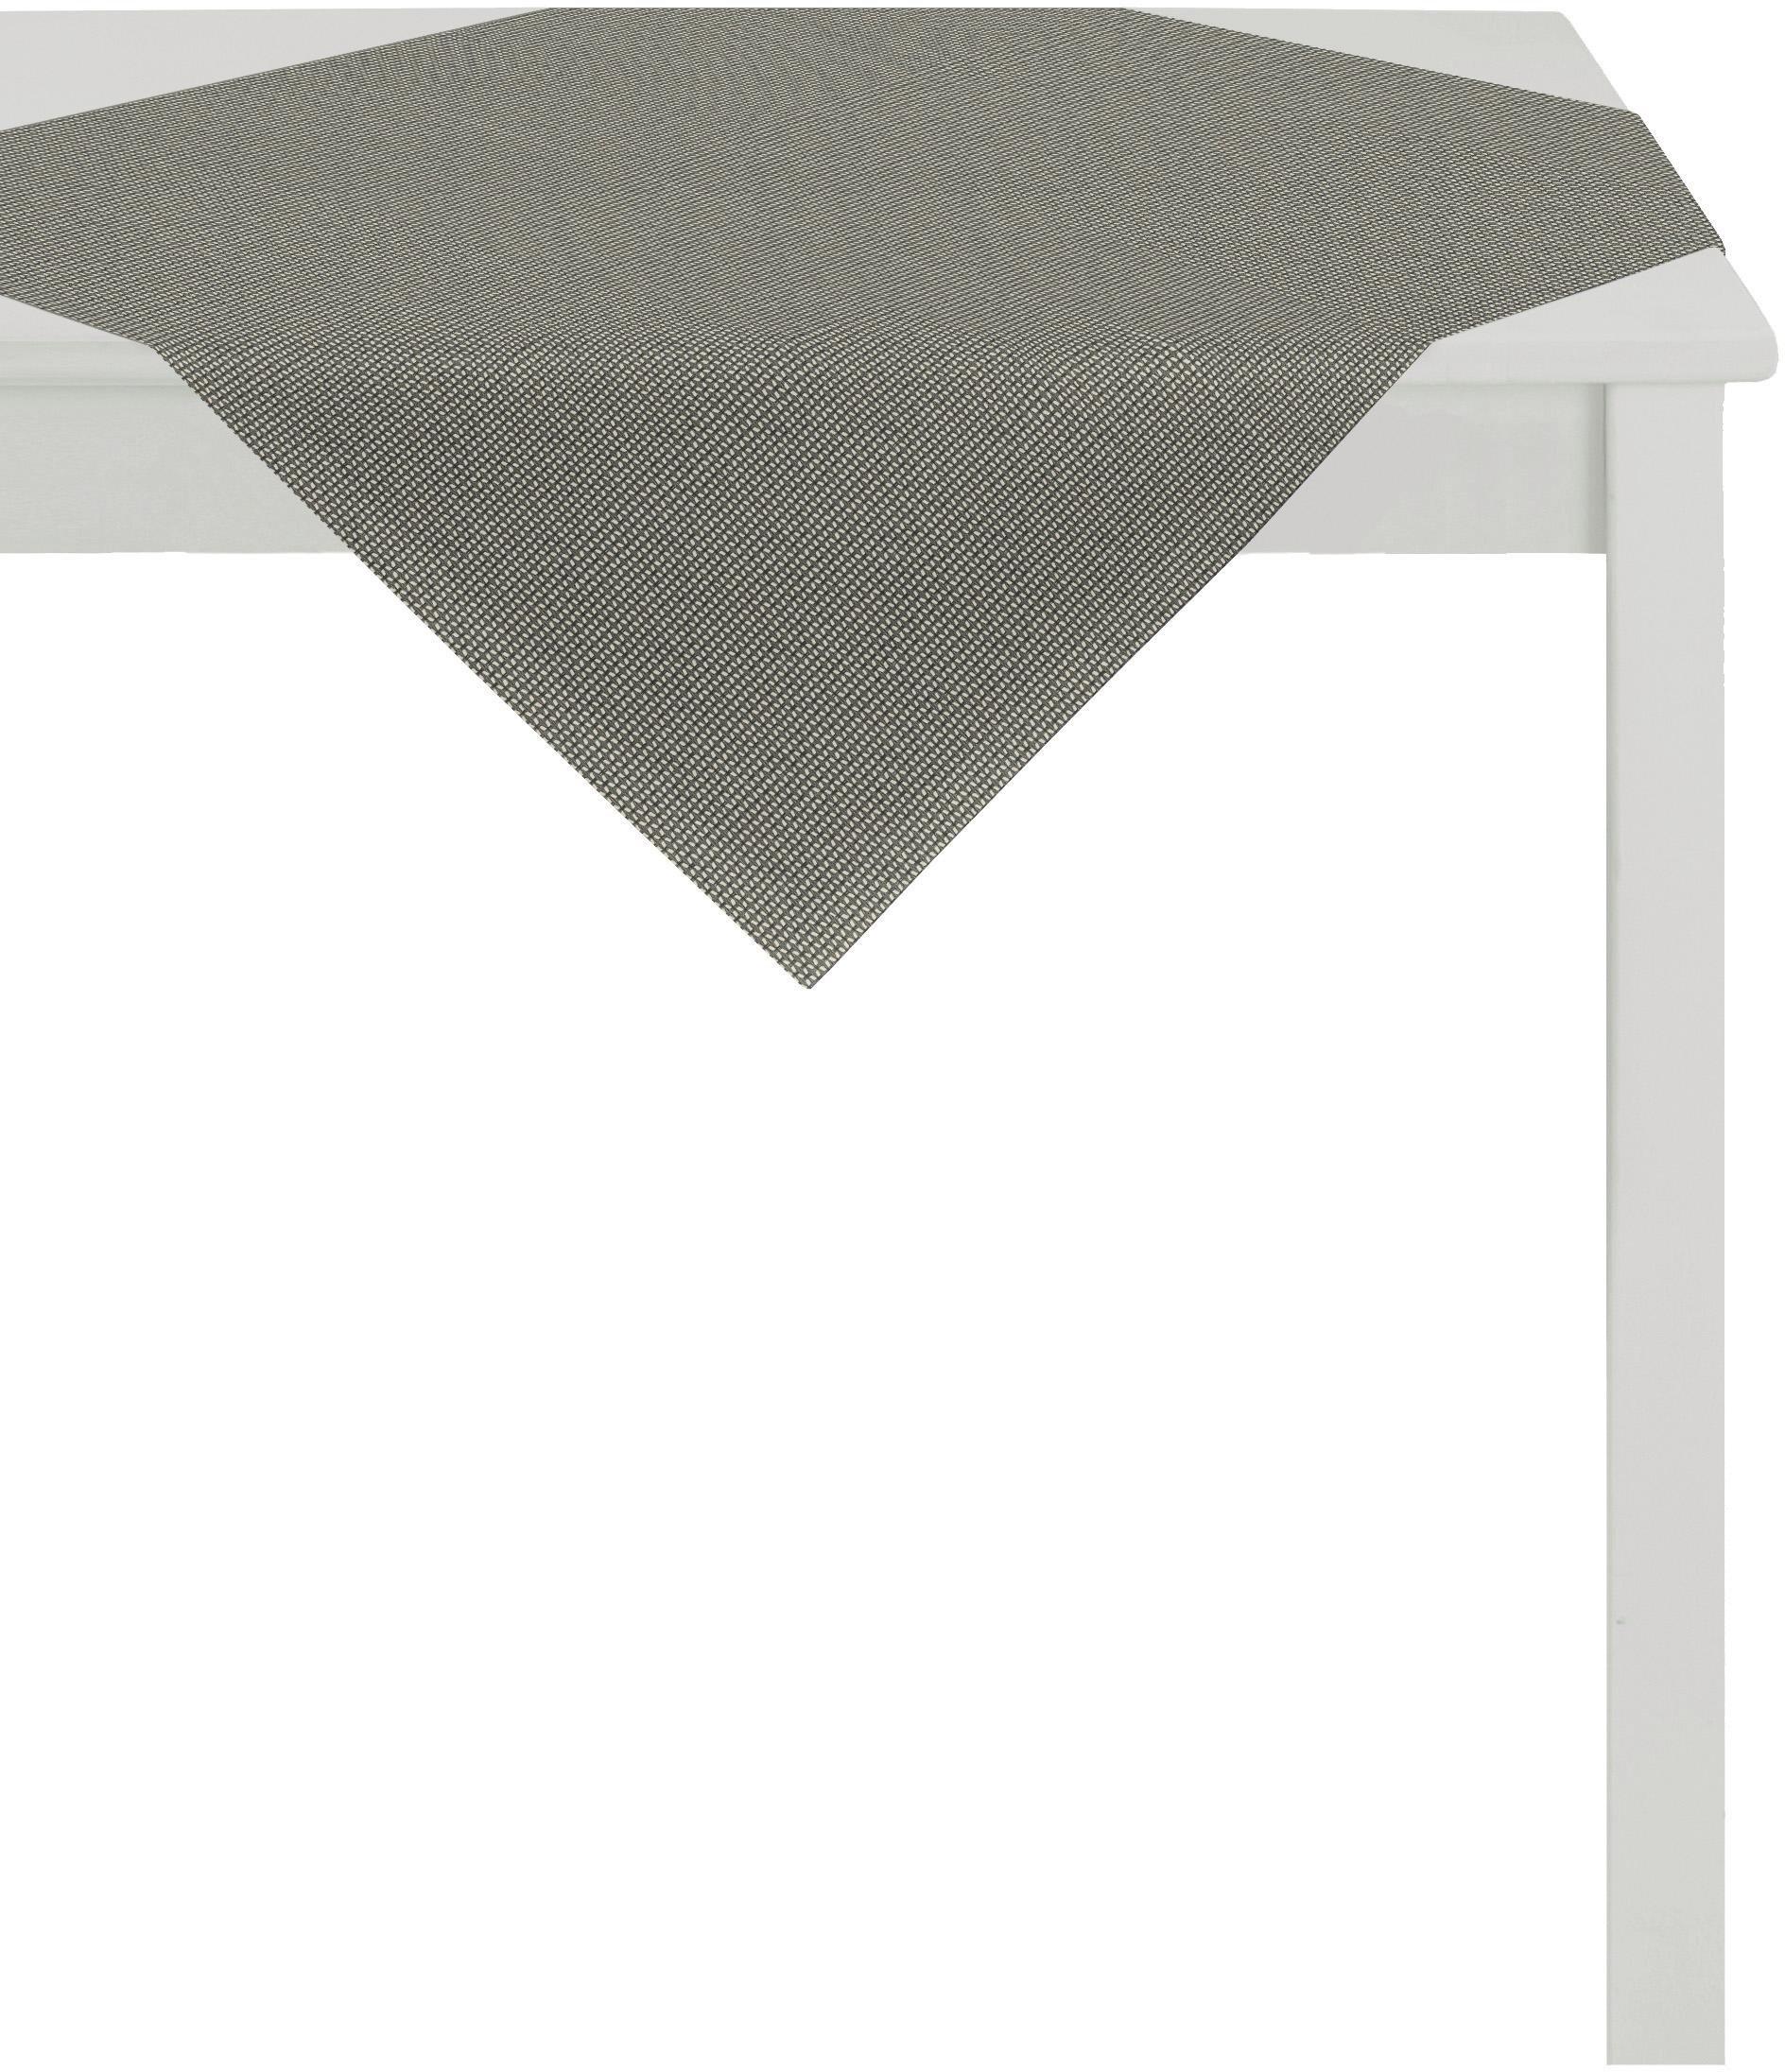 APELT topkleedje »1104 Loft Style, Jacquard« voordelig en veilig online kopen